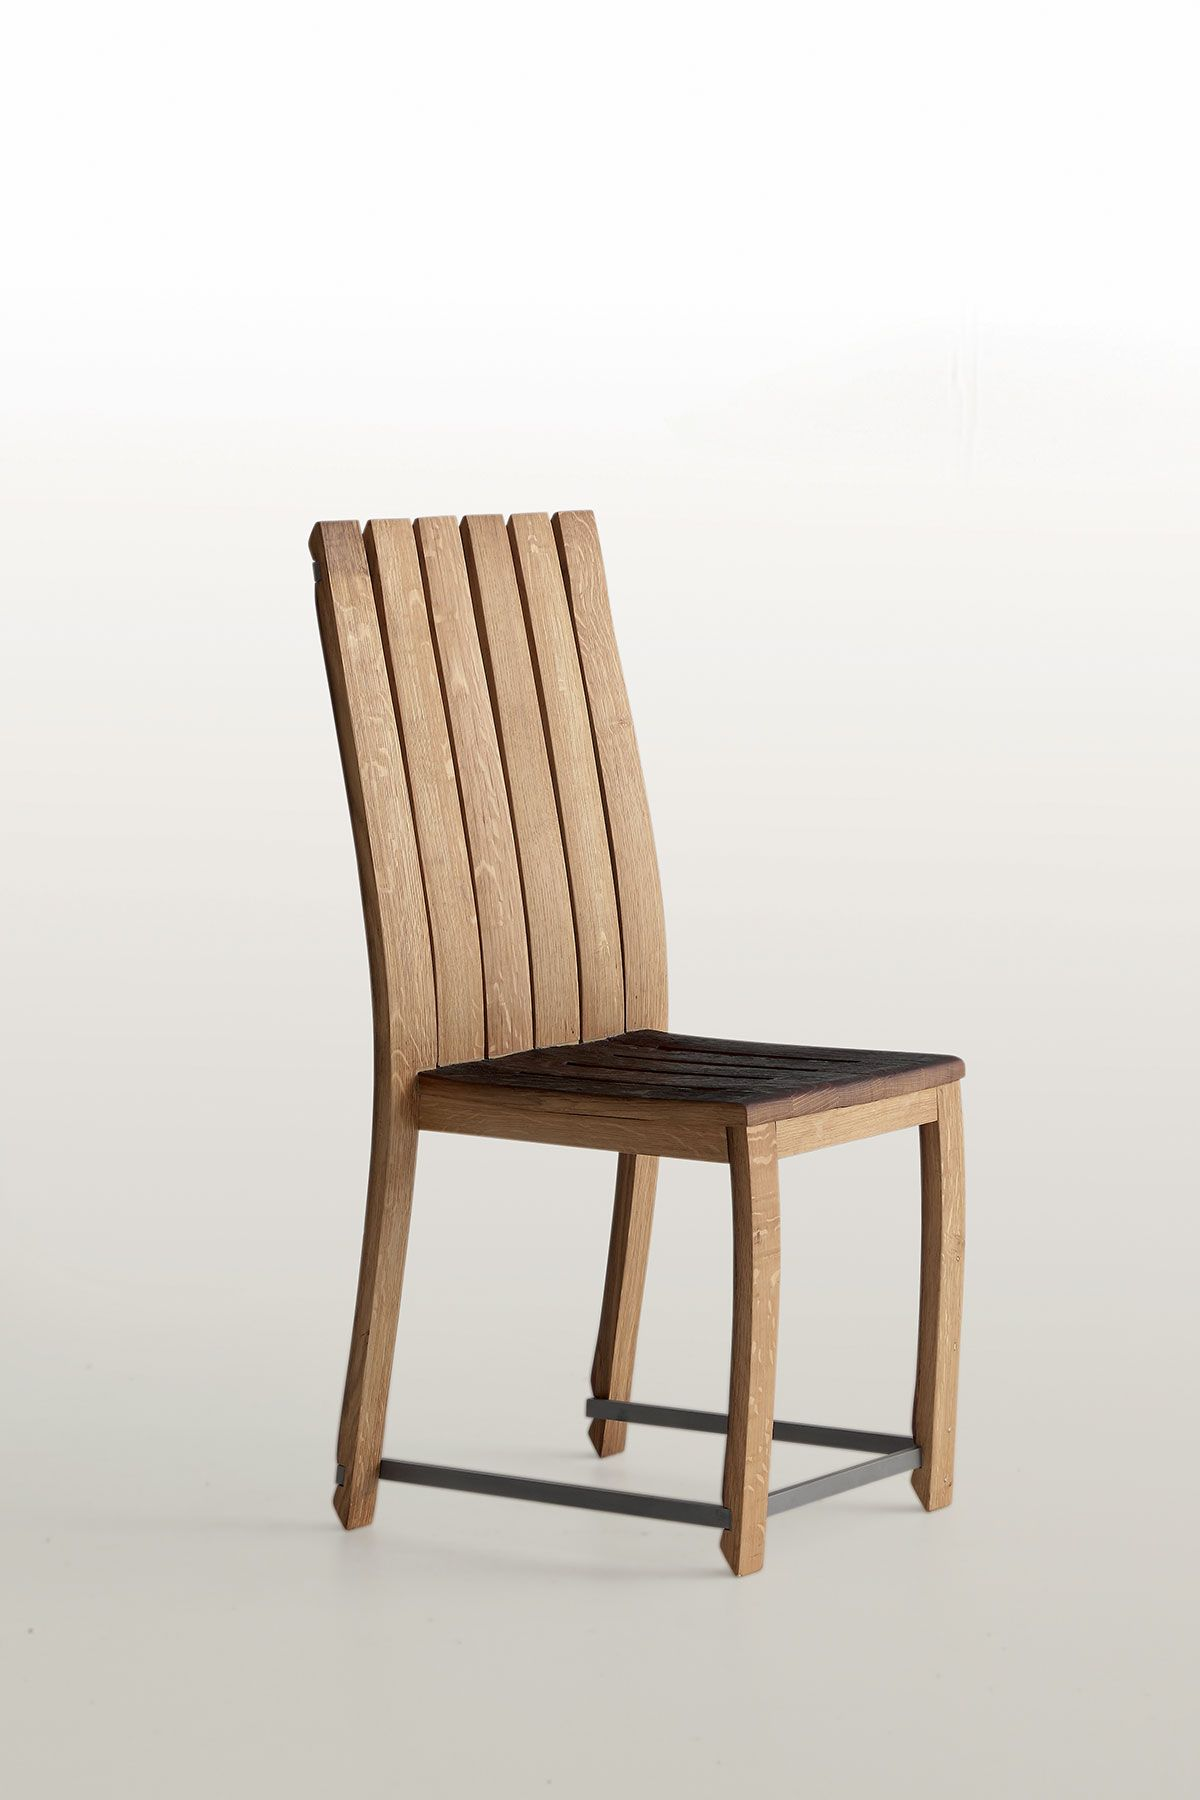 Barrique | Design Lab | Arredamento reciclato, Mobili ...